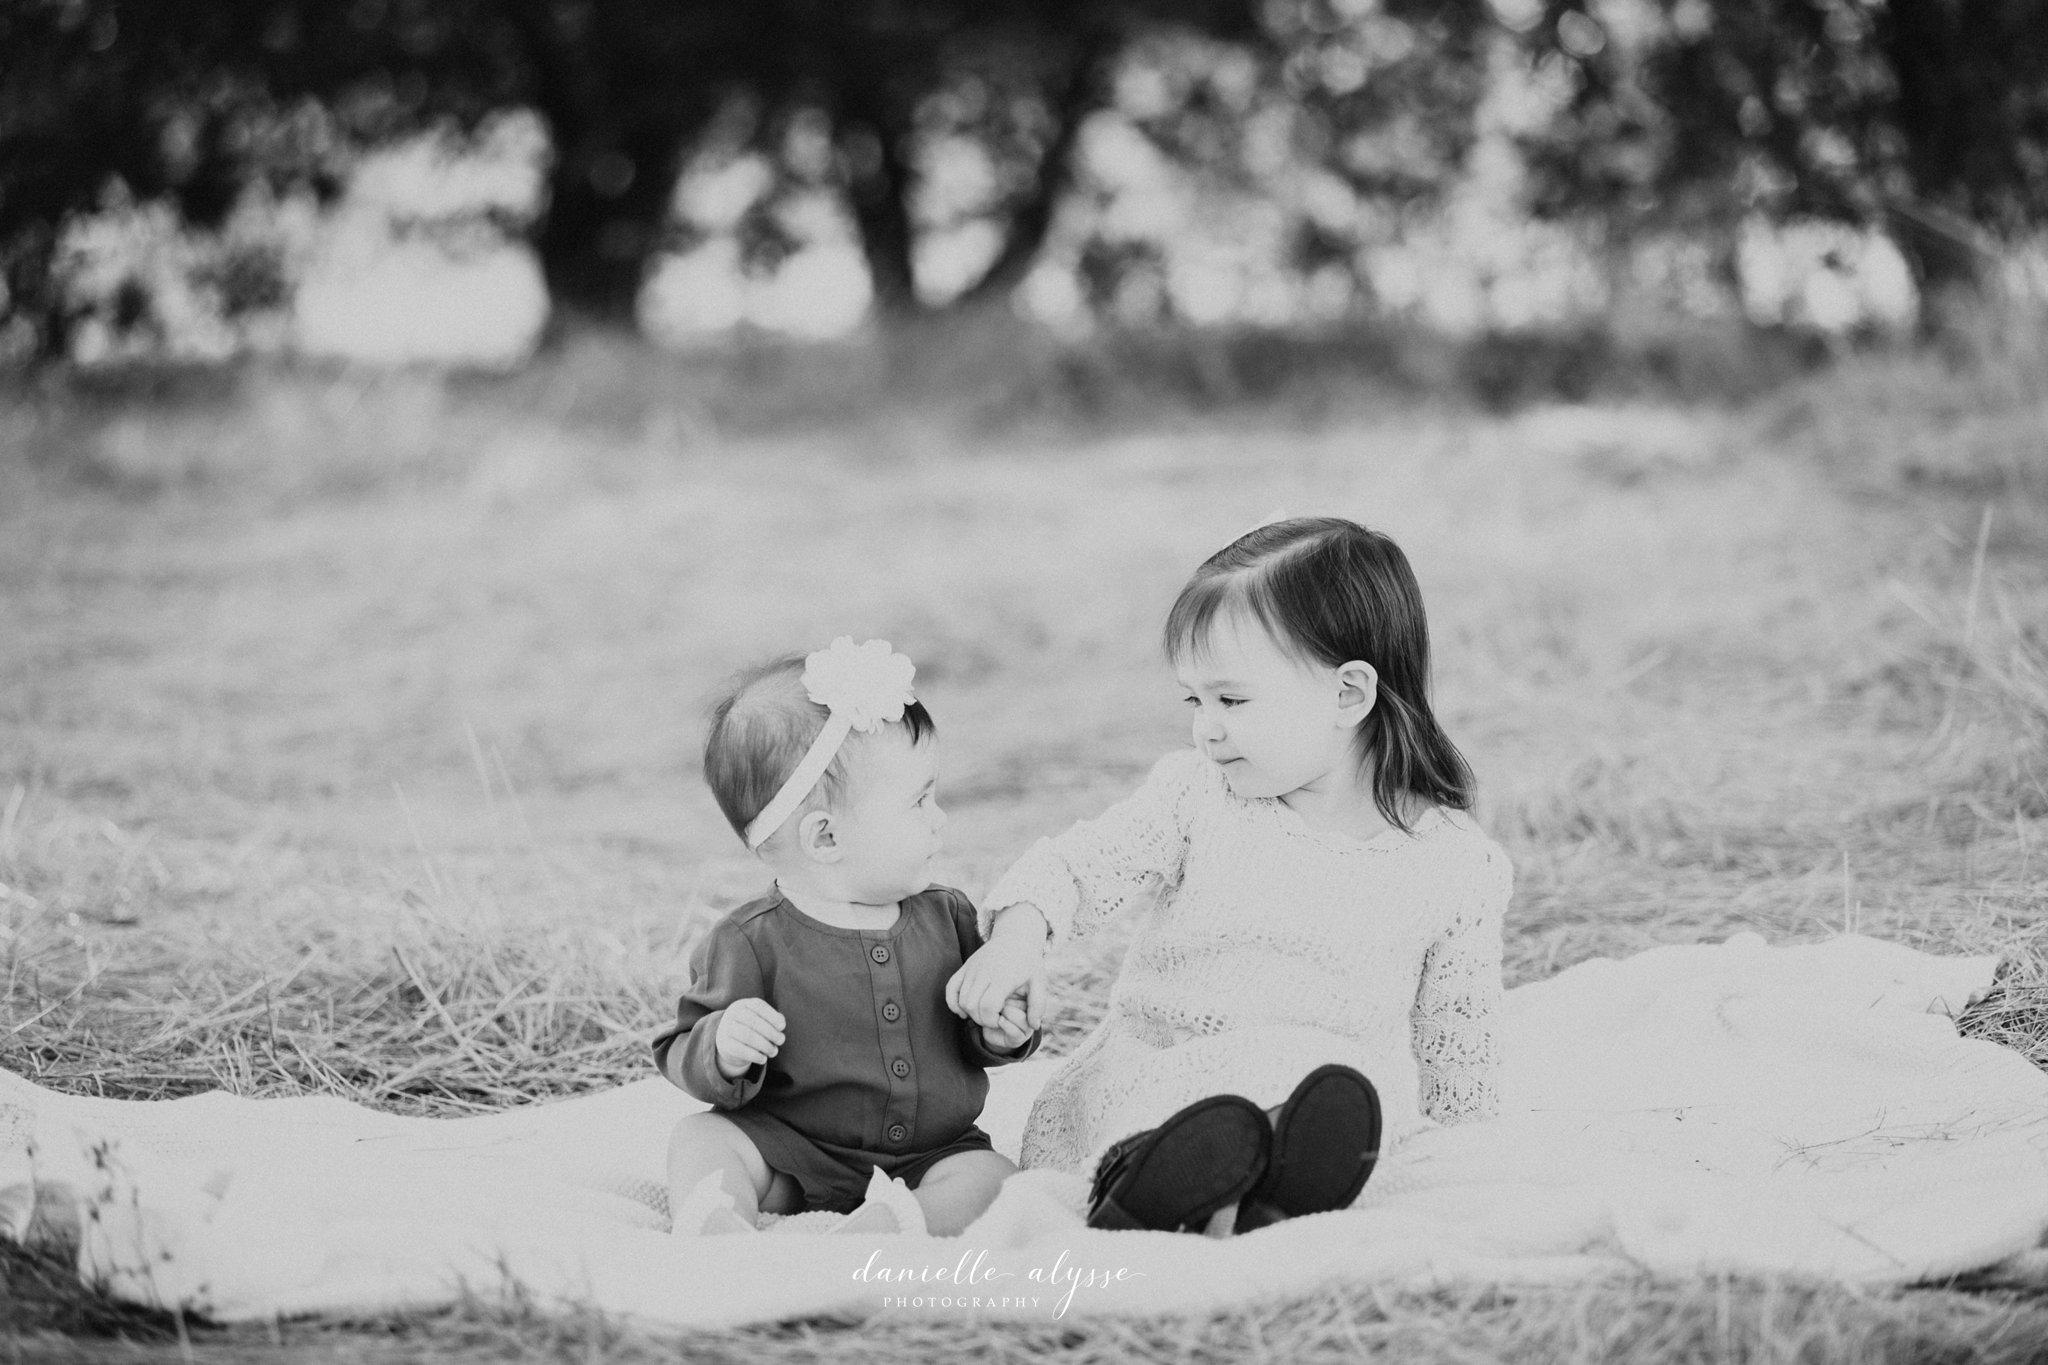 181021_fall_family_portrait_elk_grove_hill_park_monica_danielle_alysse_photography_6_WEB.jpg